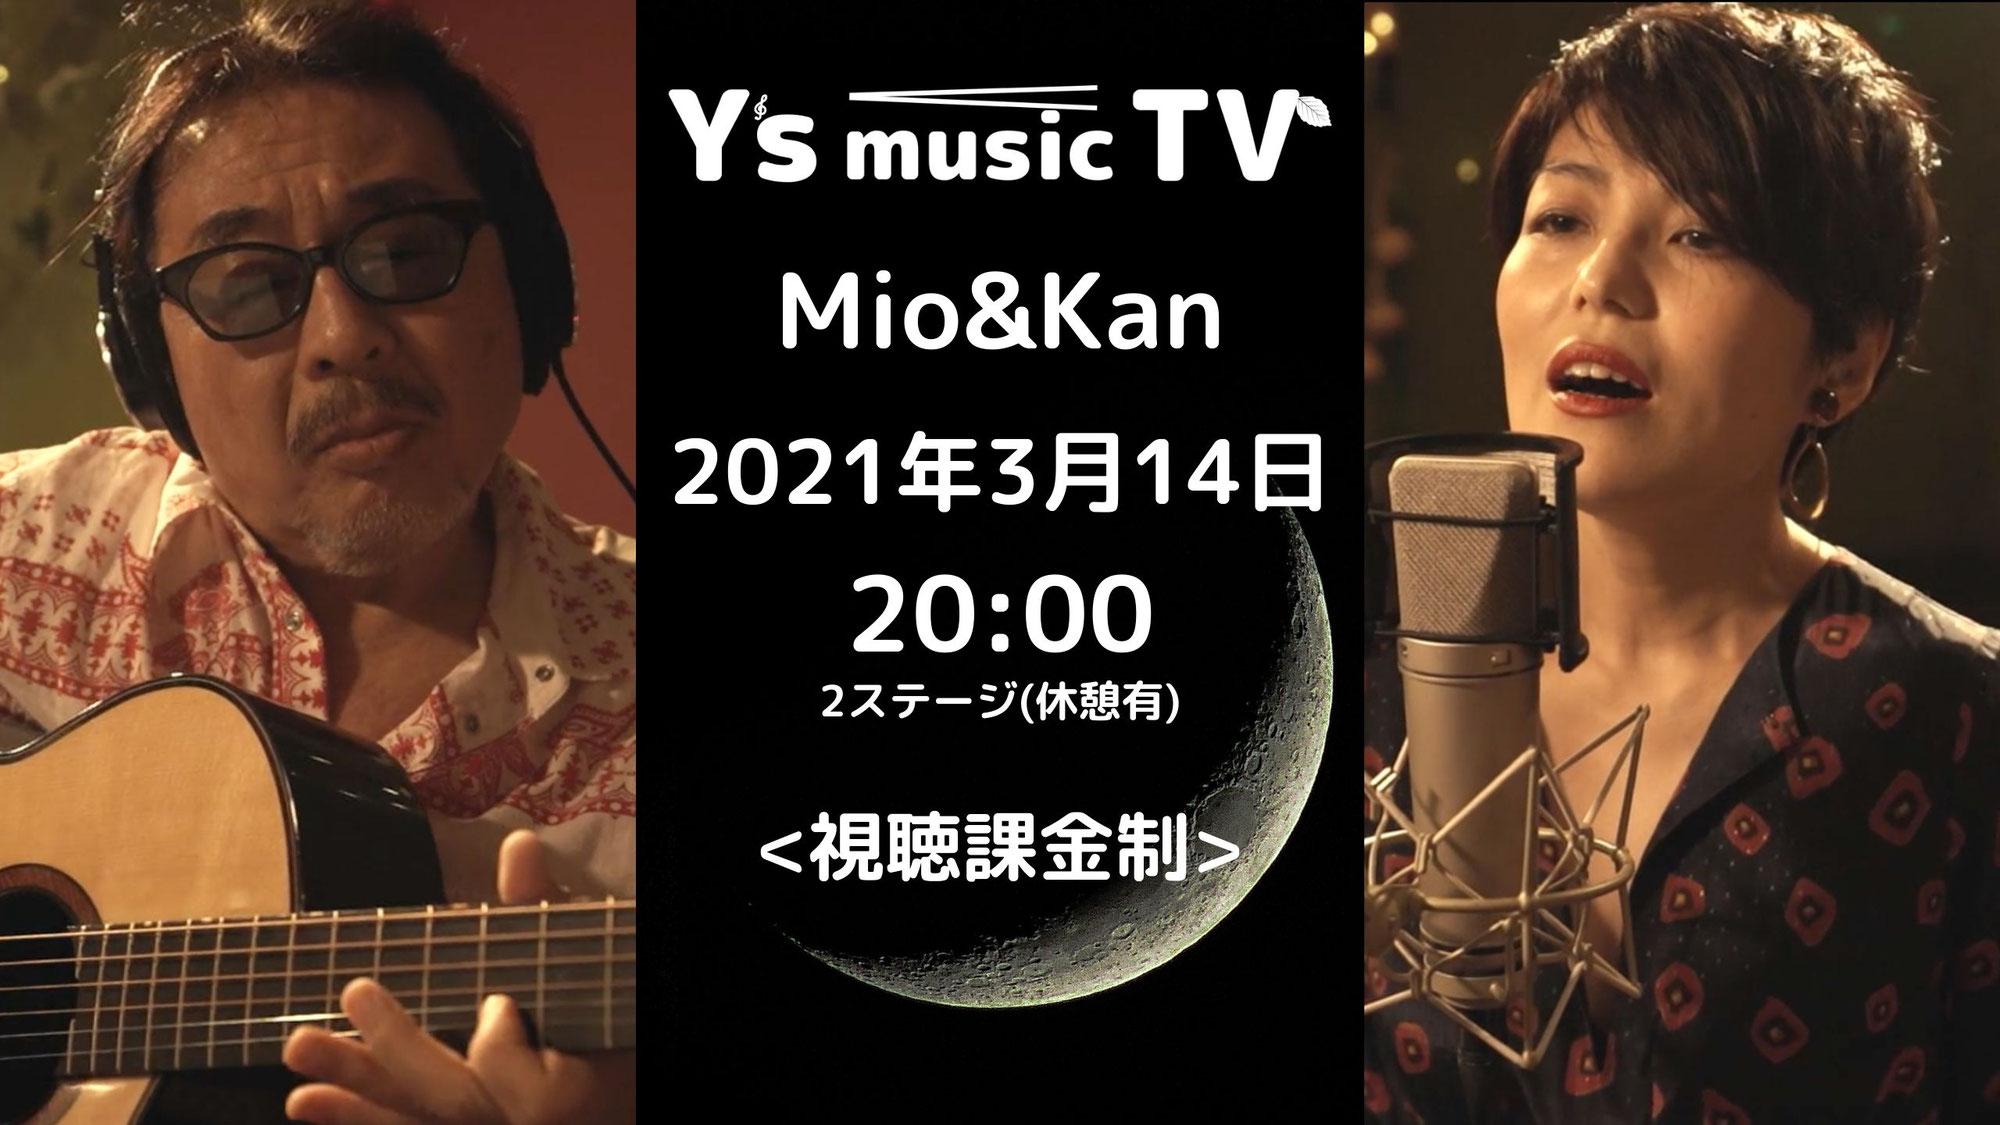 Y's music TV Mio&Kan